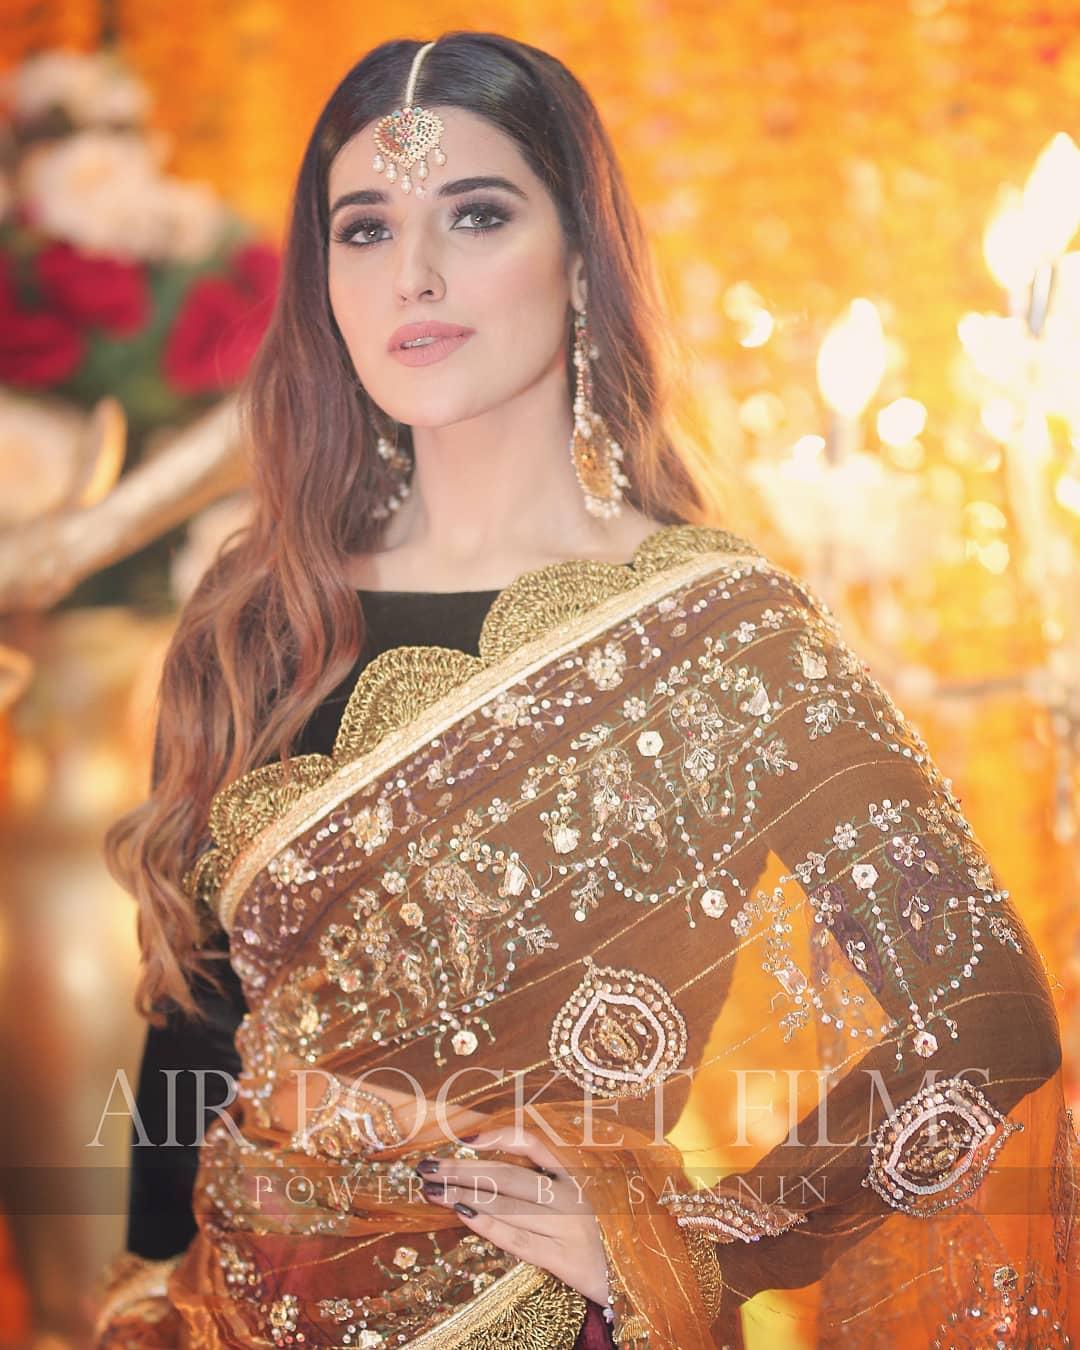 Beautiful Clicks of Gorgeous Hareem Farooq from Recent Wedding Event